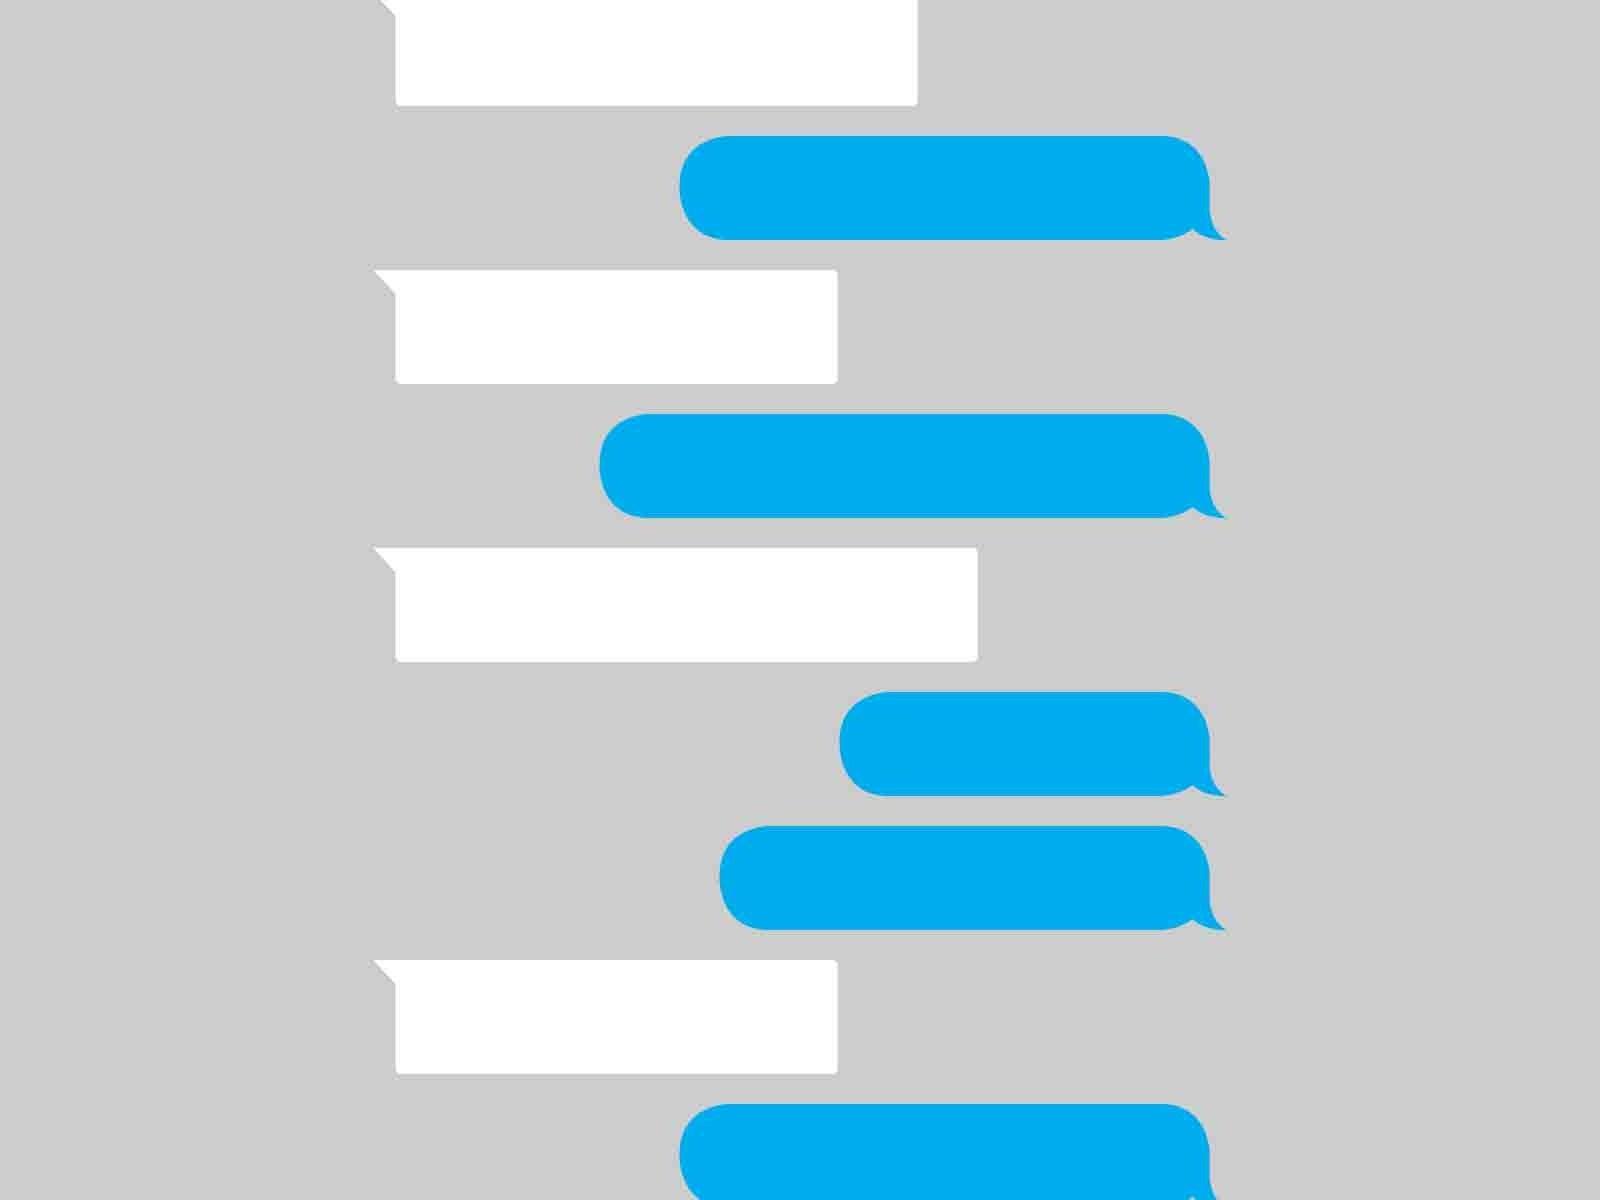 Iphone Text Bubble PNG Transparent Iphone Text Bubble.PNG Images.